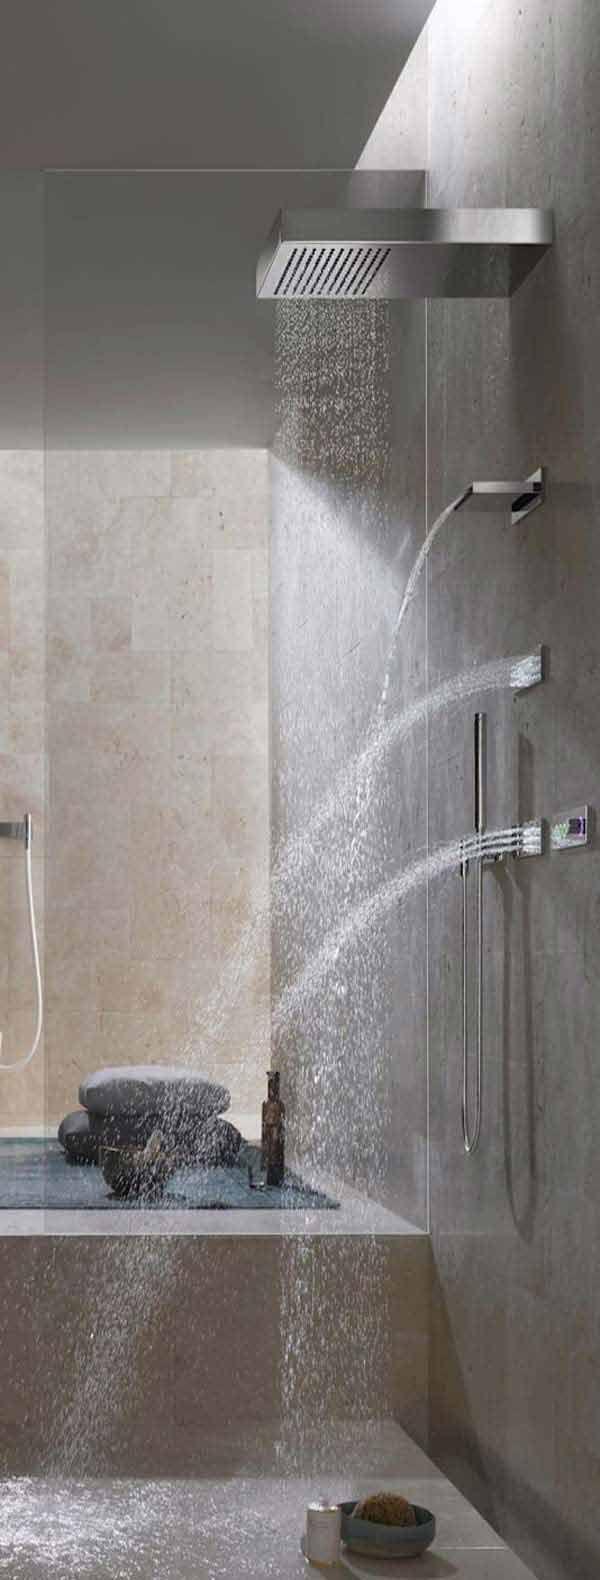 25+ Must See Rain Shower Ideas for Your Dream Bathroom